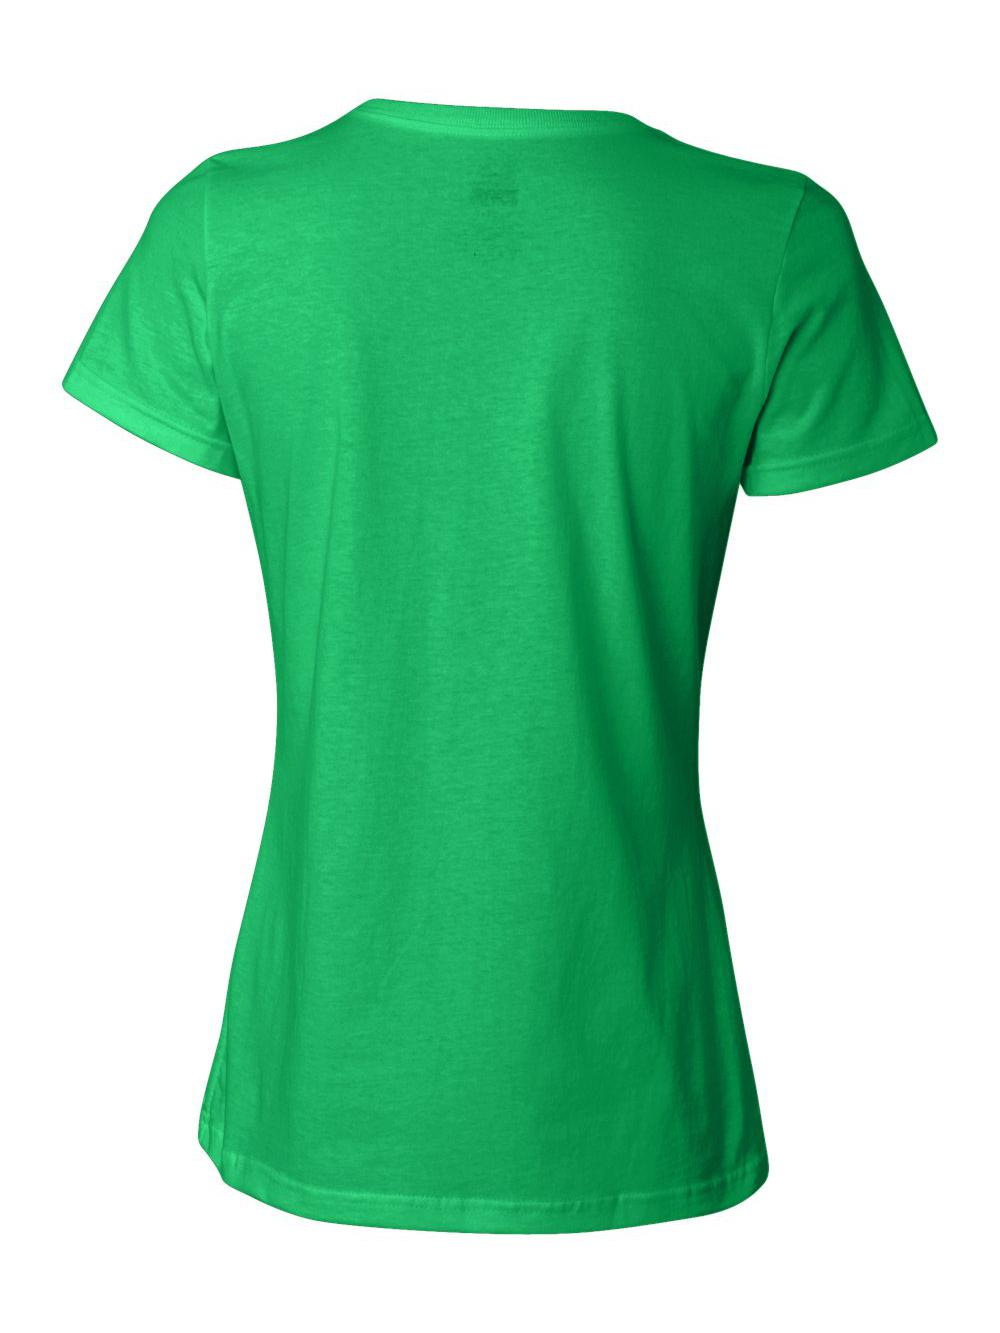 Fruit-of-the-Loom-HD-Cotton-Women-039-s-Short-Sleeve-T-Shirt-L3930R thumbnail 19